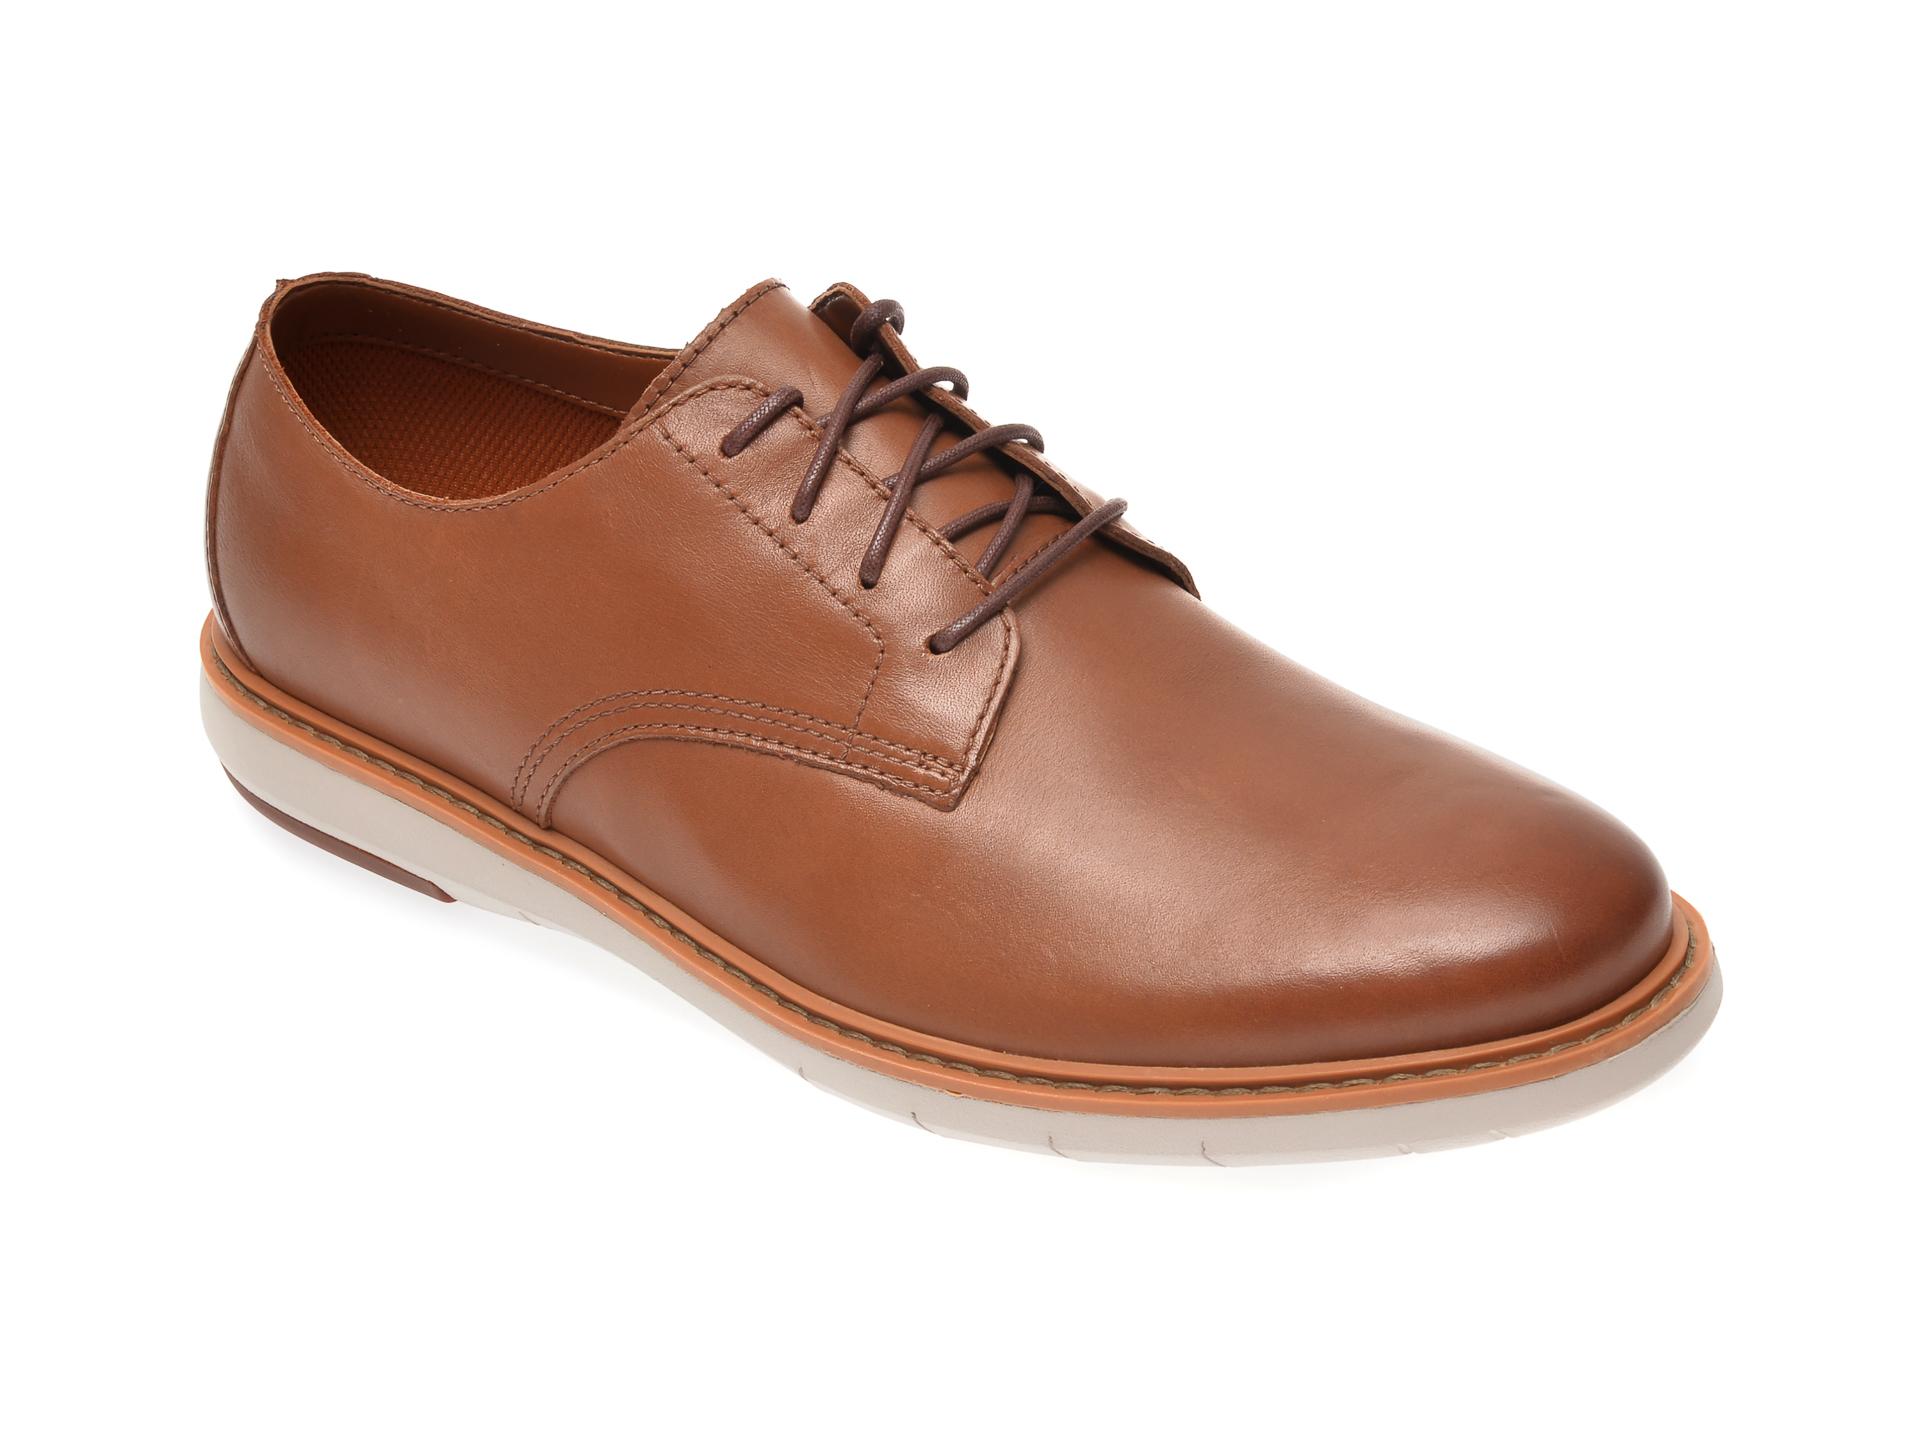 Pantofi CLARKS maro, Draper Lace, din piele naturala imagine